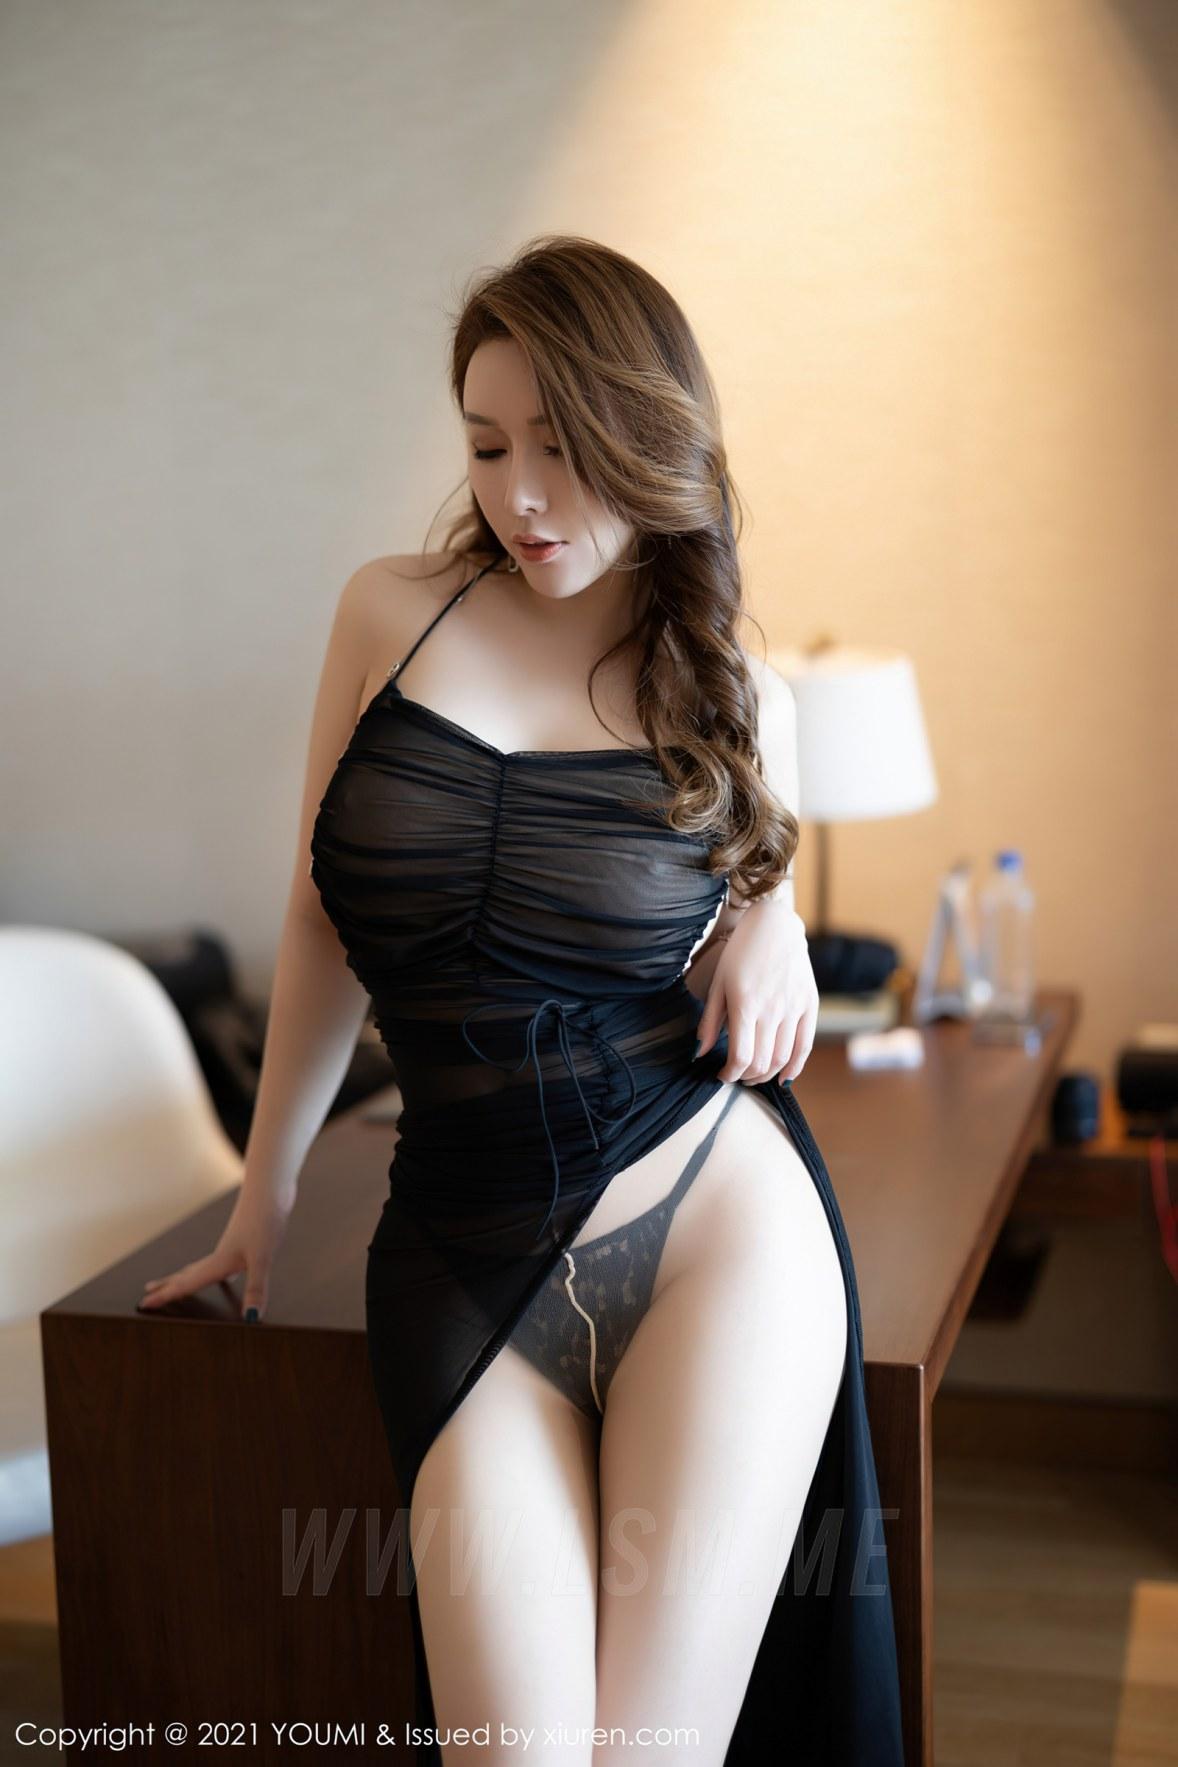 YOUMI 尤蜜荟 Vol.583 熟女翘臀 尤妮丝 薄透魅惑 - 4